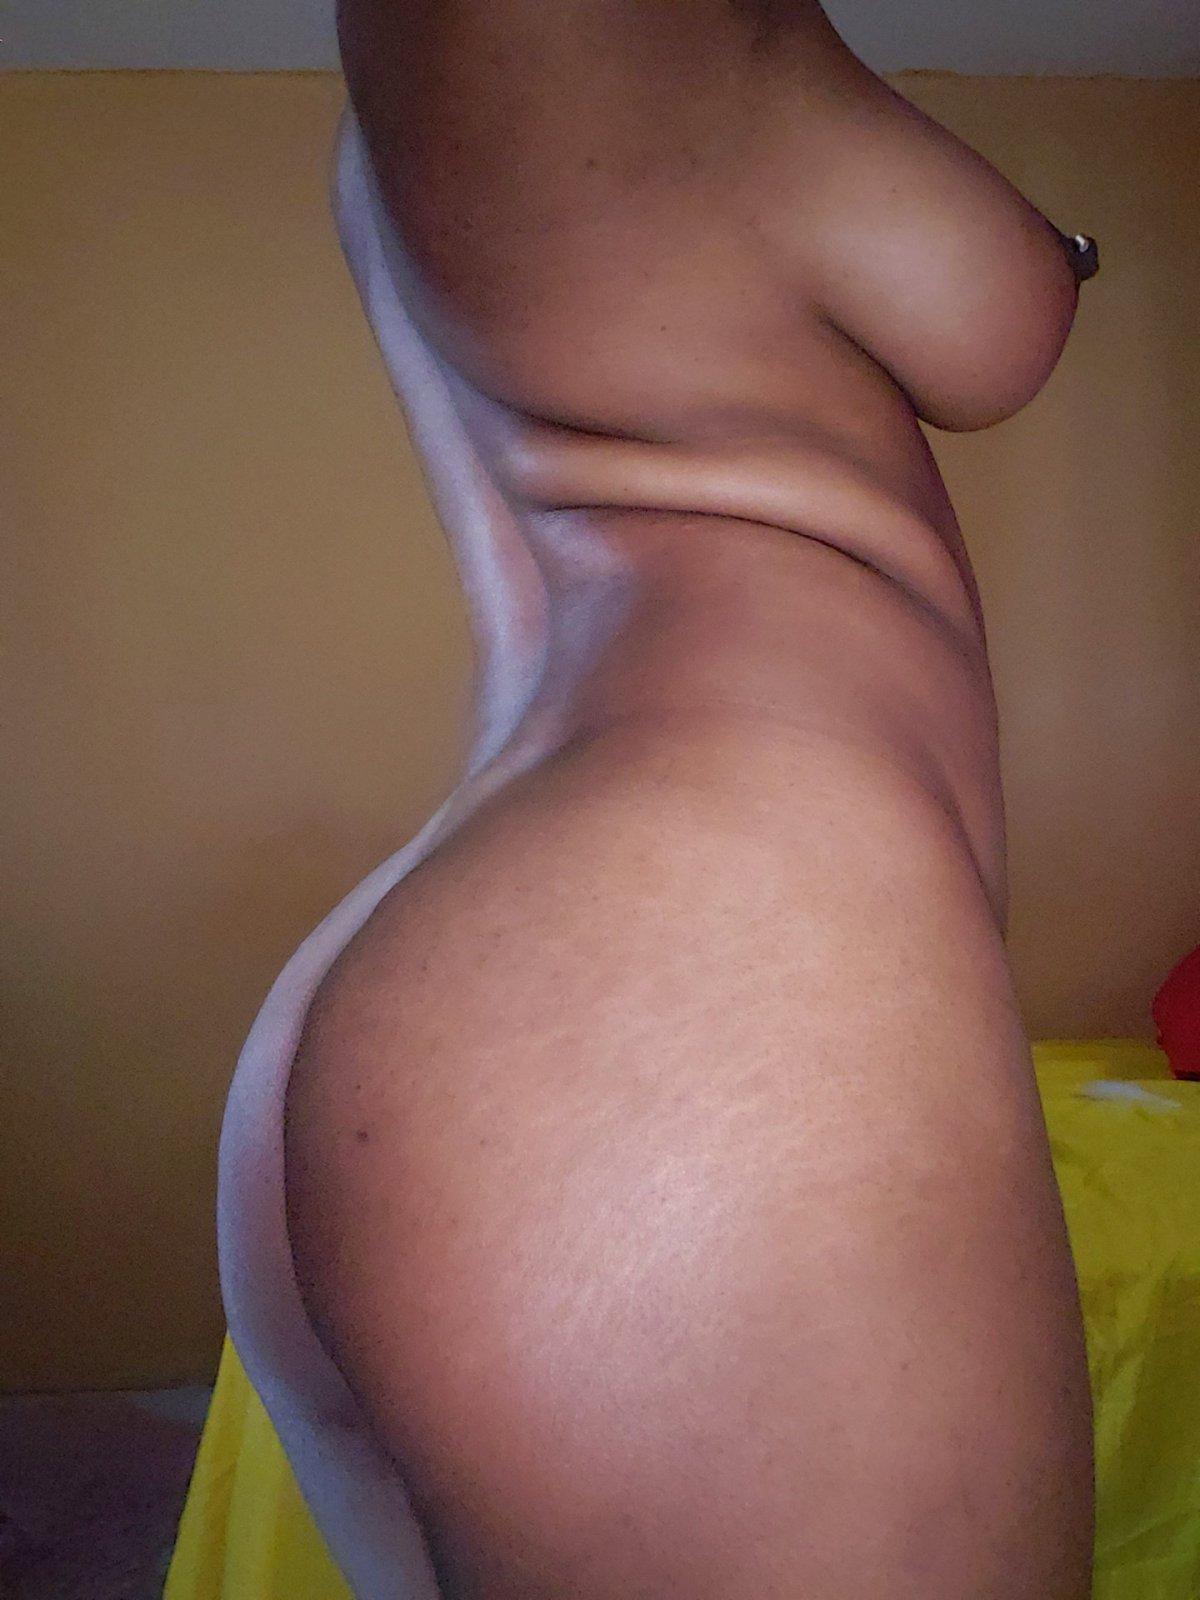 skyhi-naked-photo.jpg